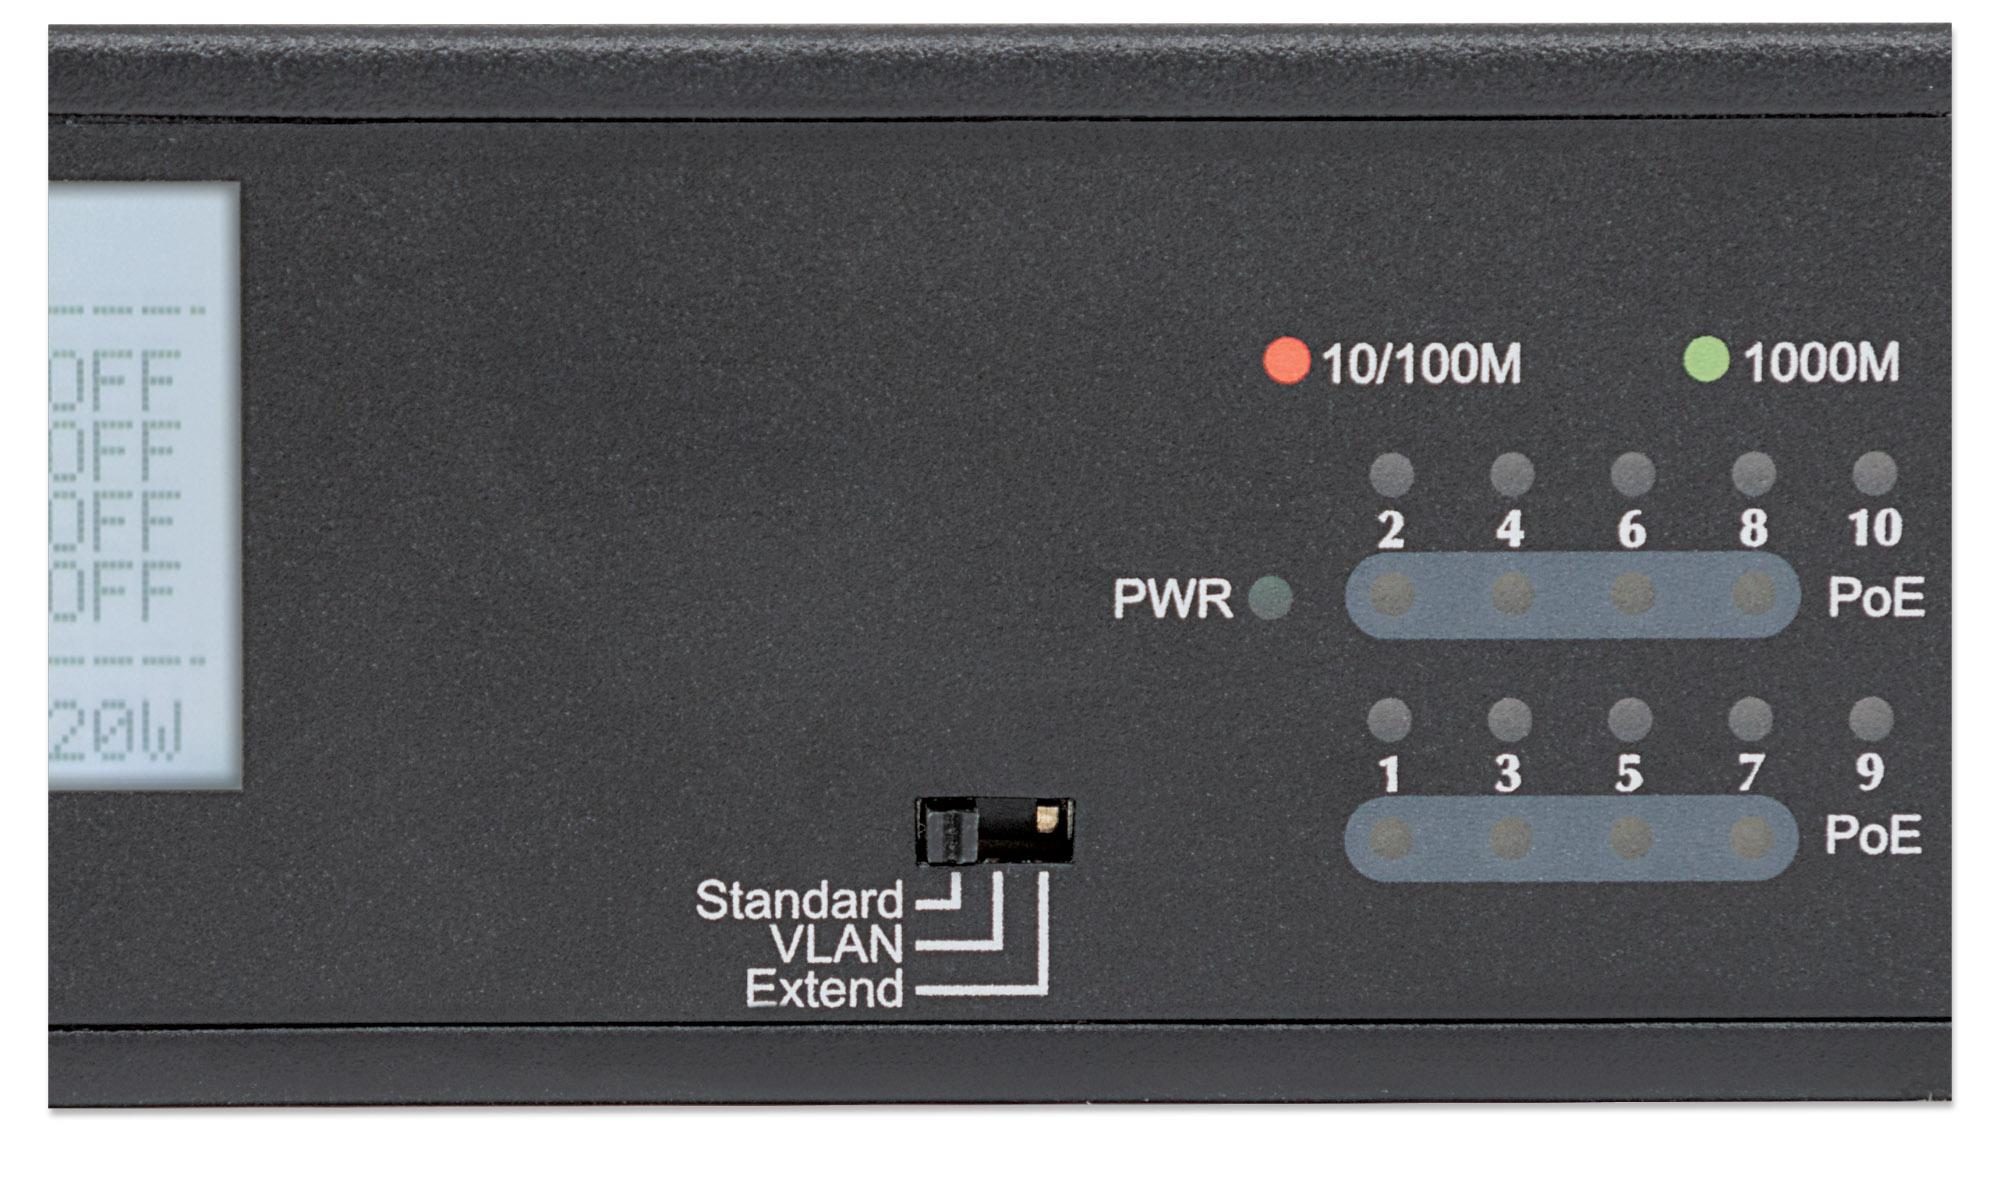 8-Port Gigabit Ethernet PoE+ Switch with 2 RJ45 Gigabit Uplink Ports and LCD Screen